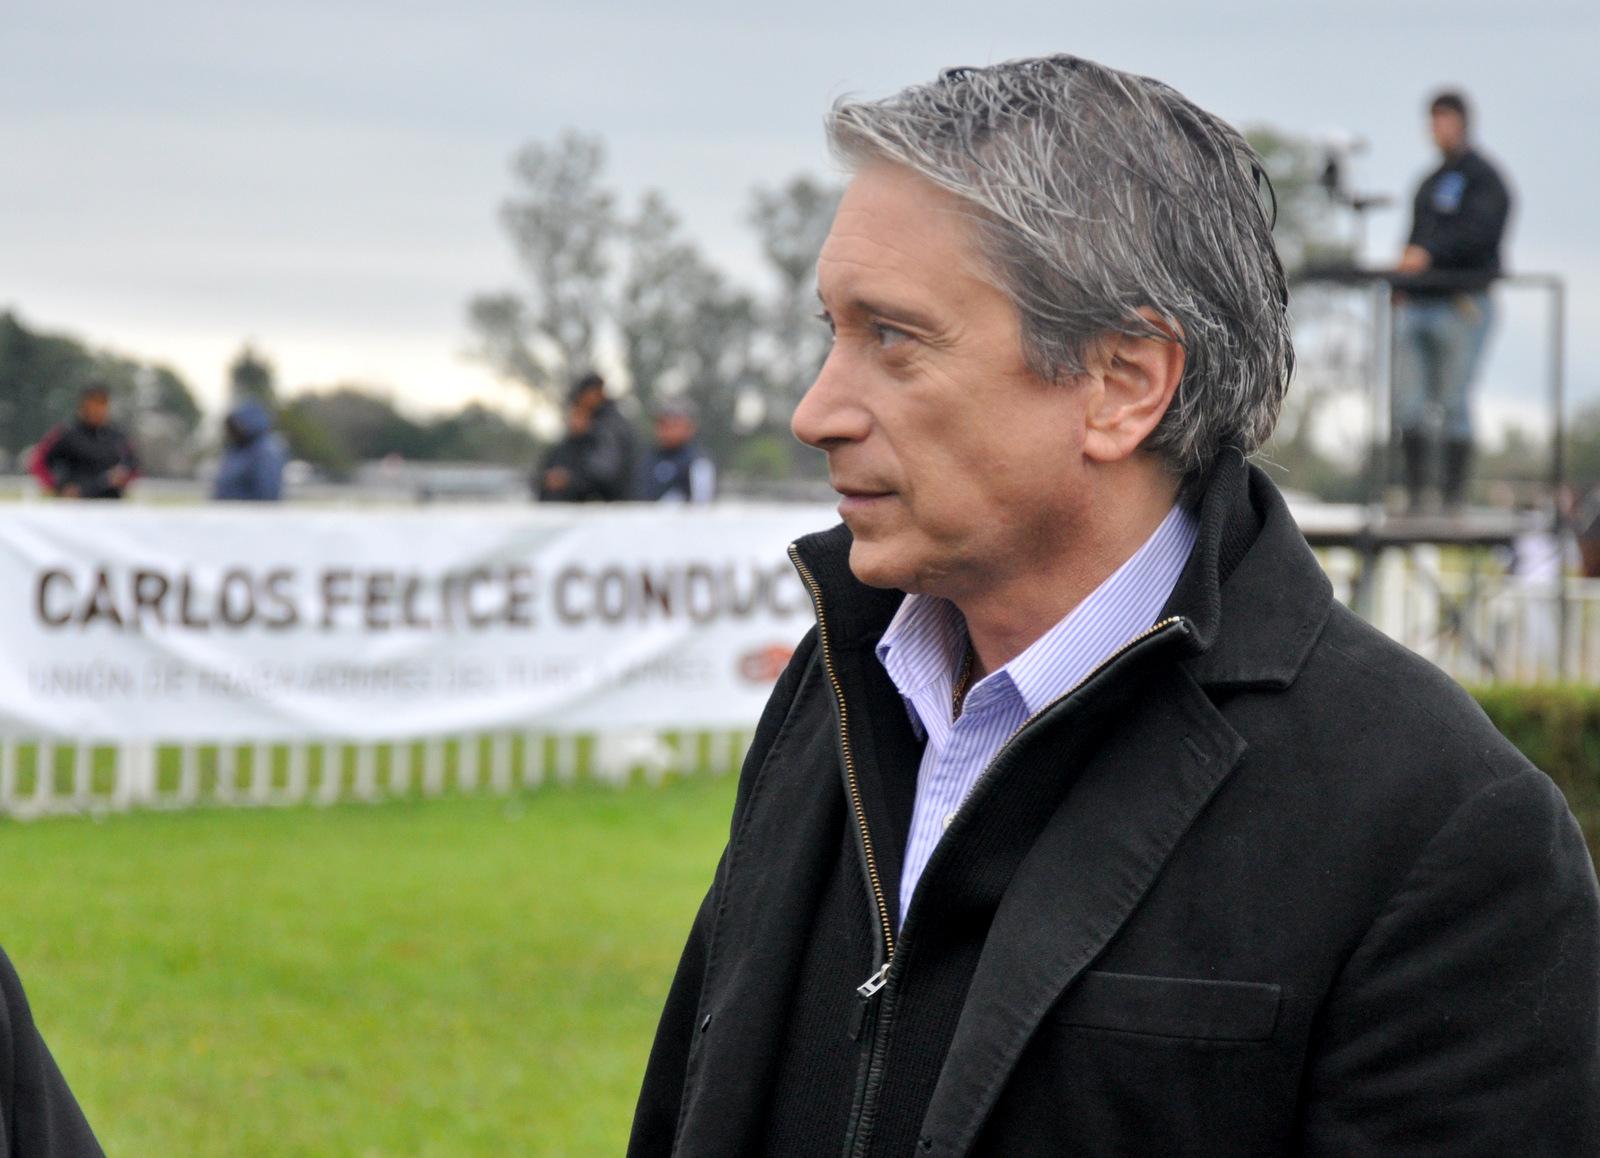 Carlos Felice OSPAT